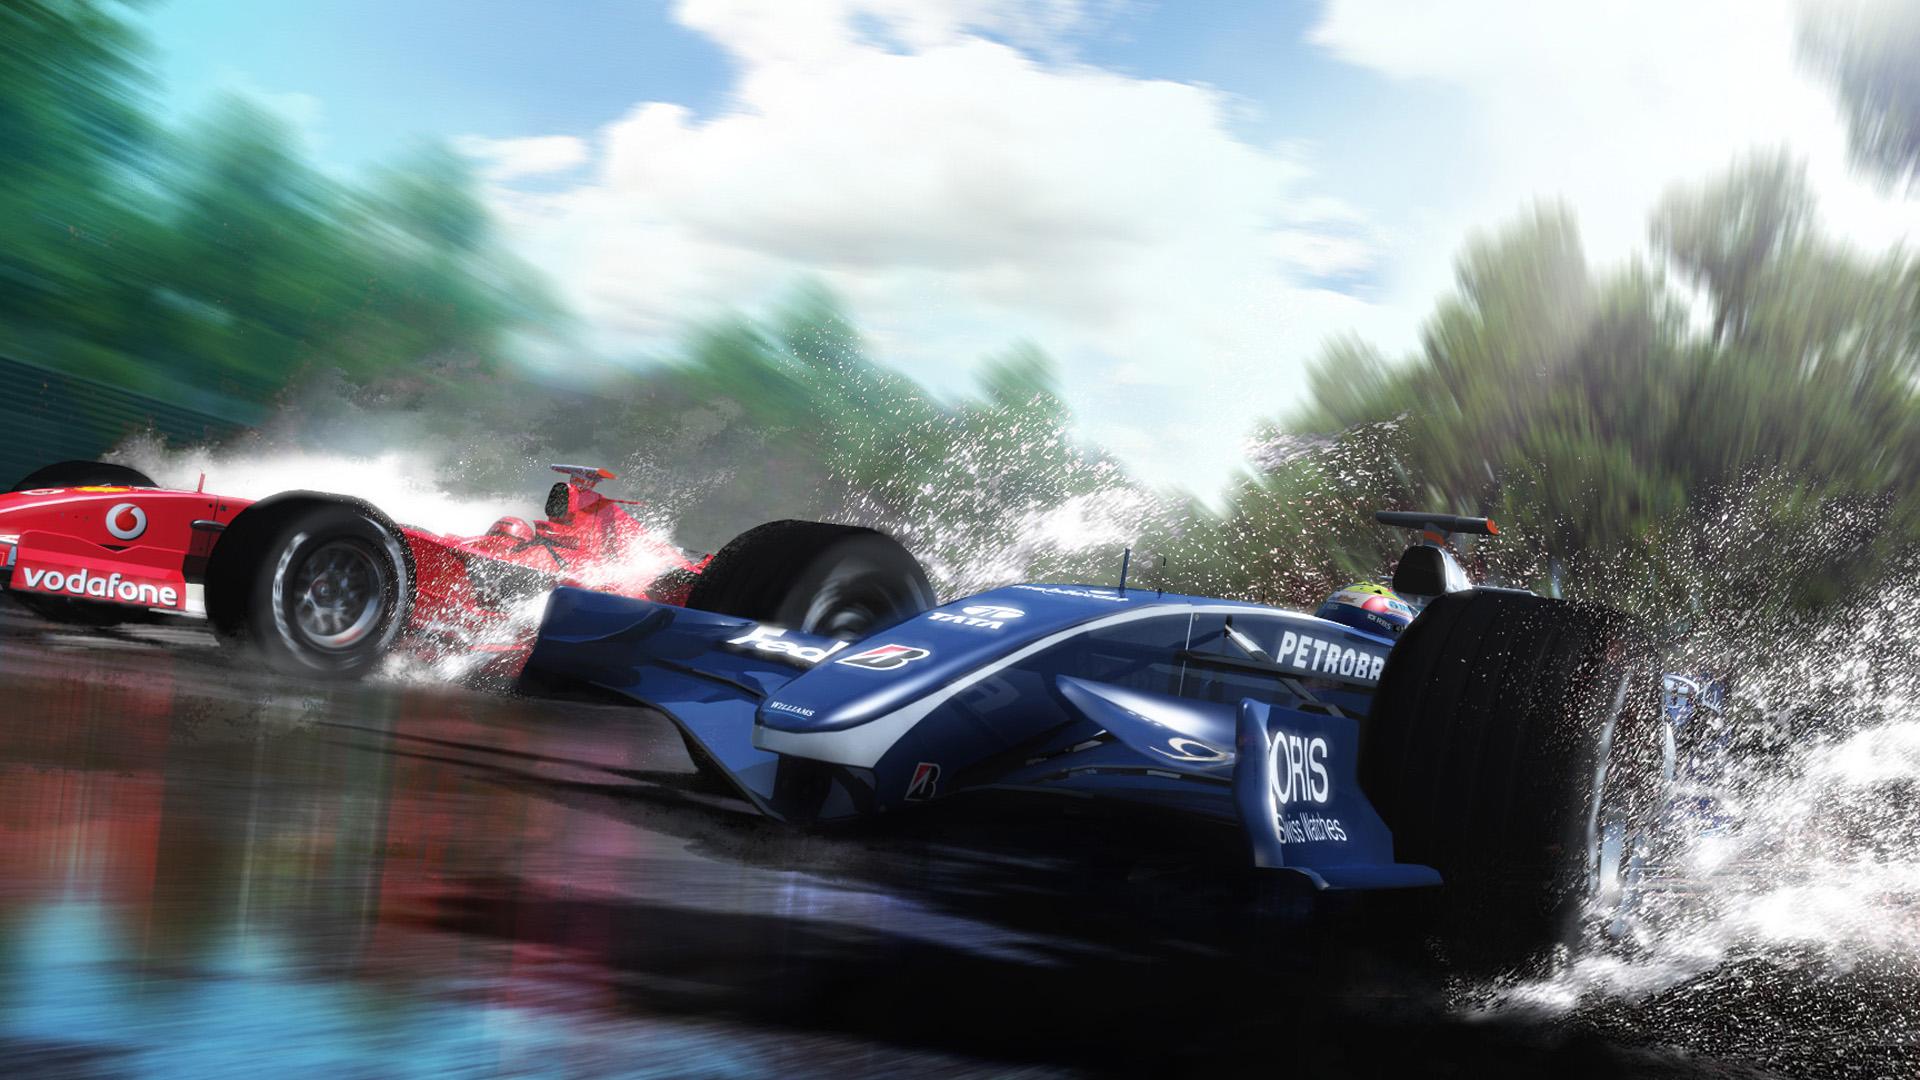 Ferrari Logo Wallpaper 3d F1 Pole Position 2 Details Launchbox Games Database